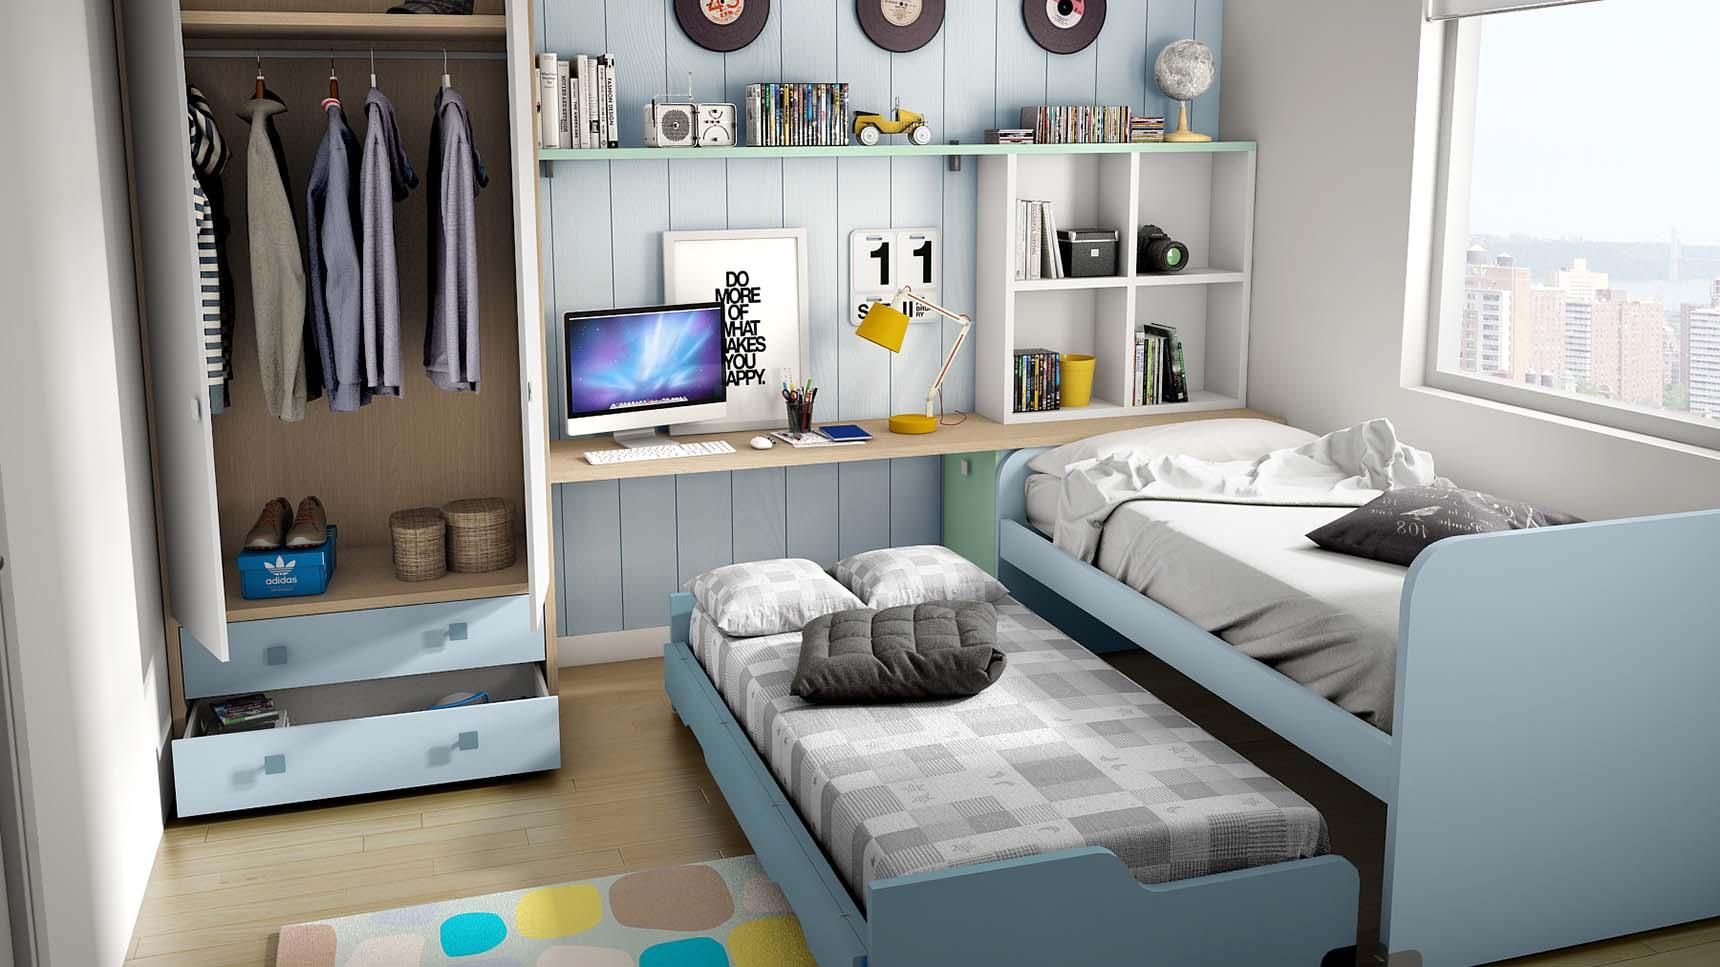 Ideh bita habitaci n juvenil con dos camas for Habitacion juvenil dos camas